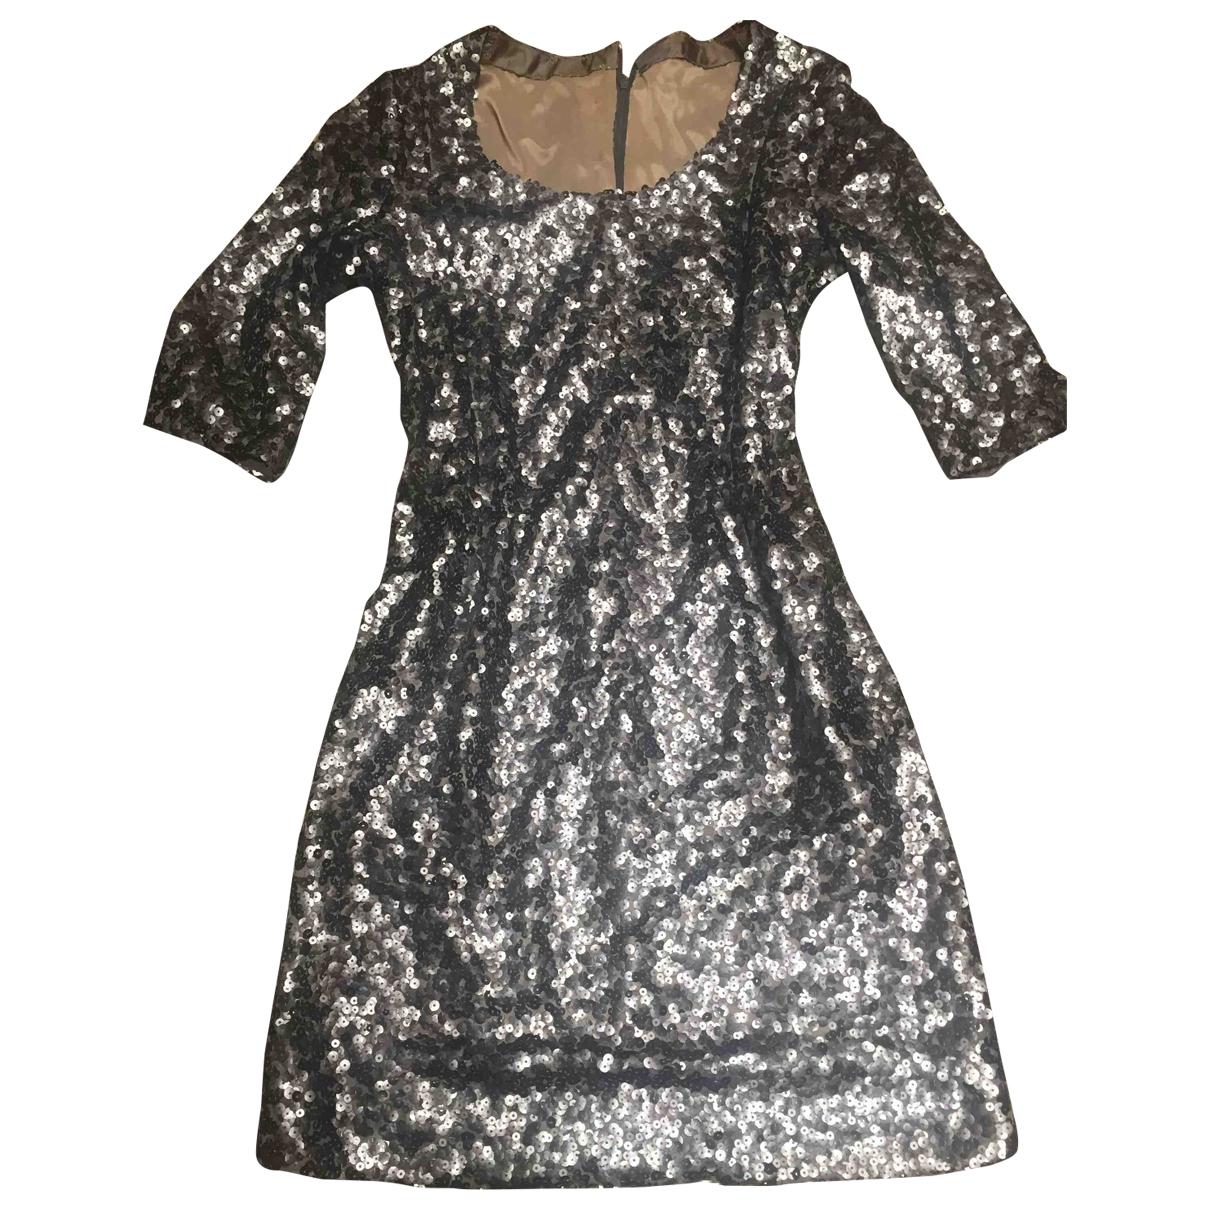 Vestido de Con lentejuelas Non Signe / Unsigned